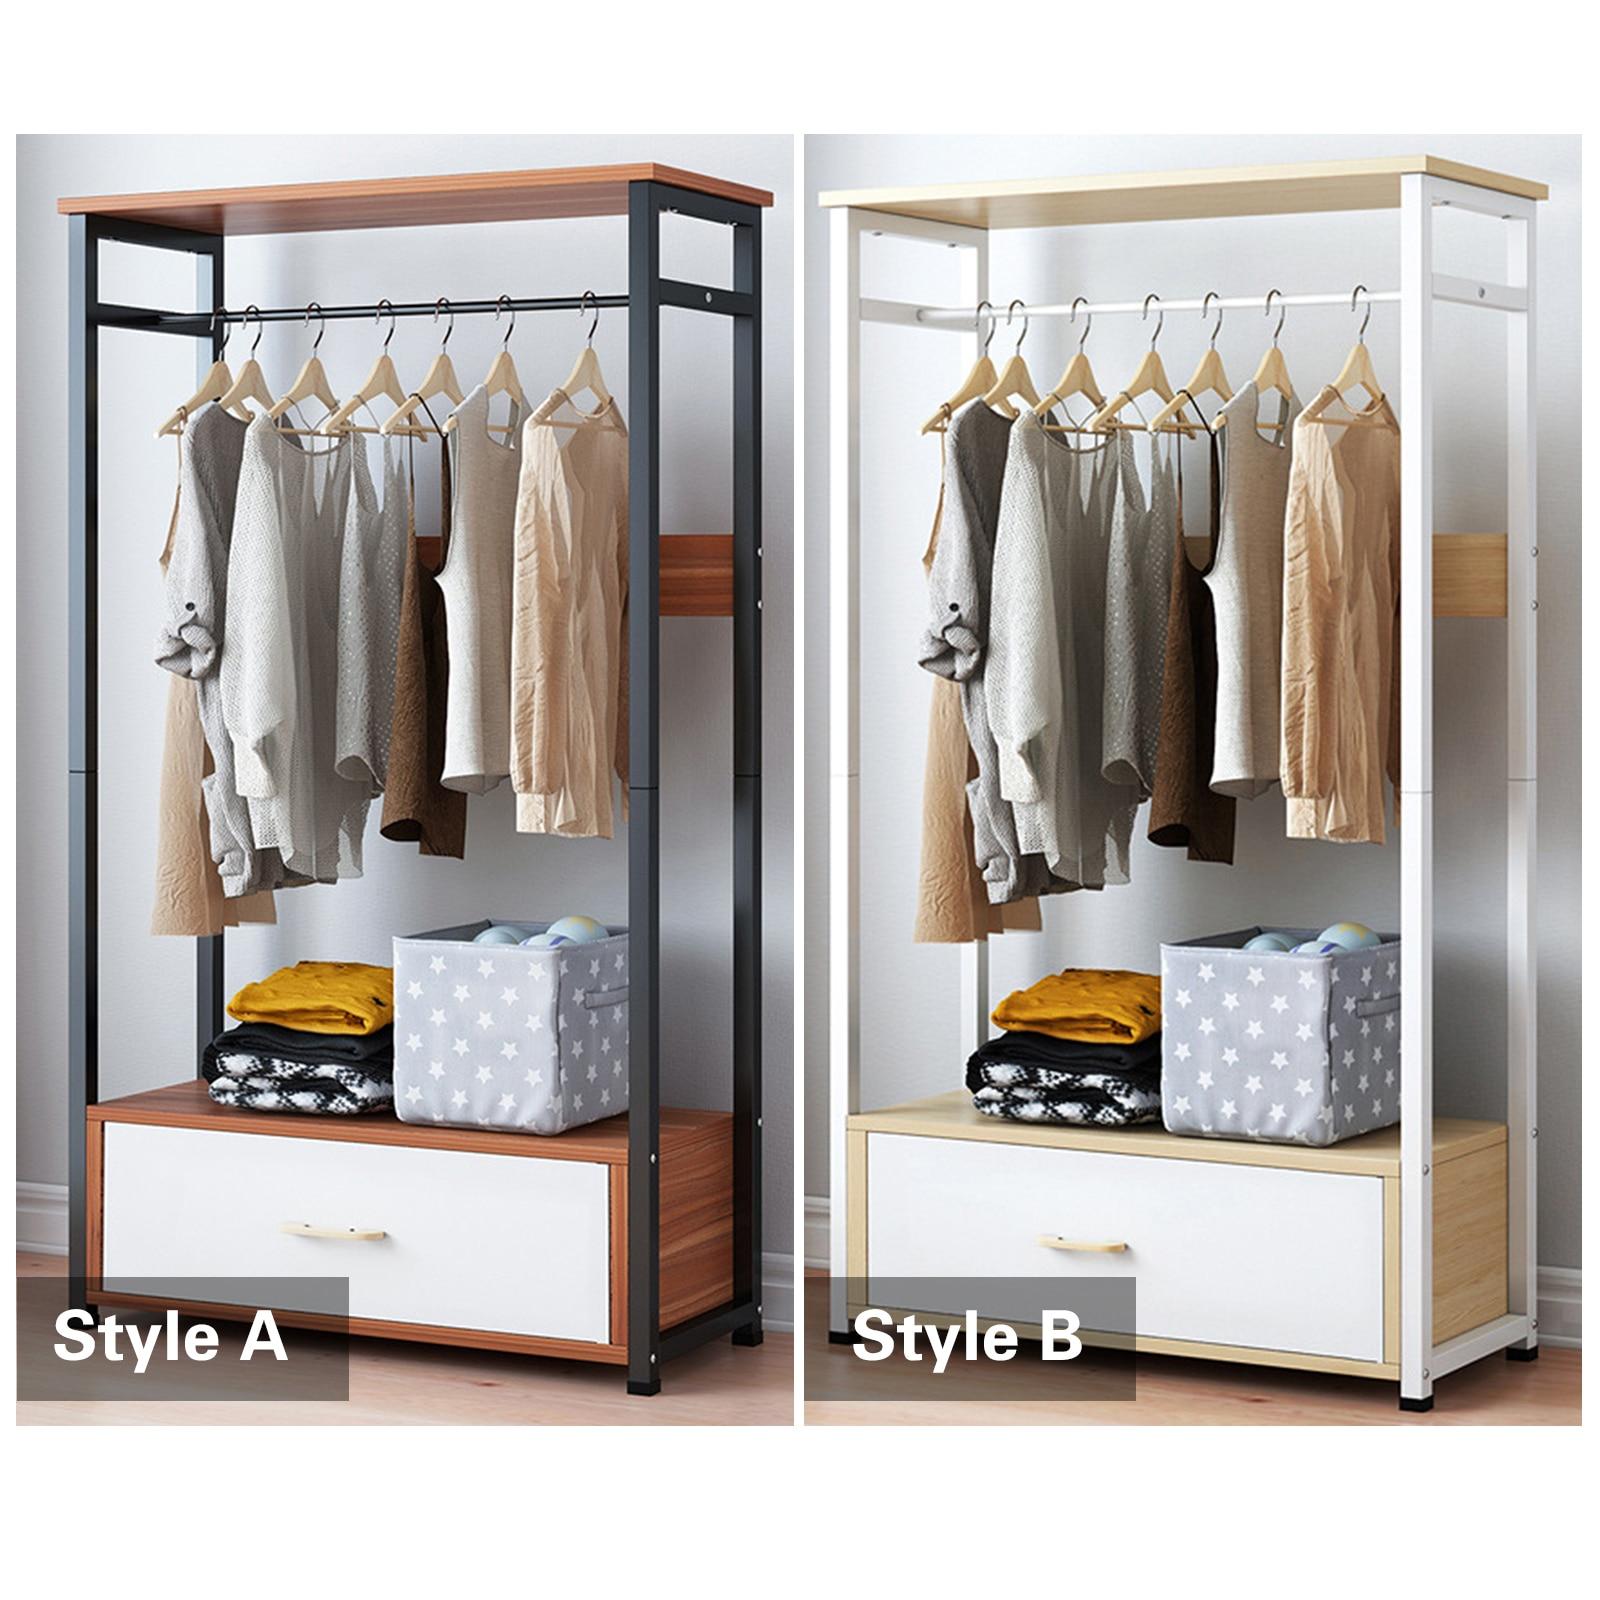 Clothes Rail Rack Garment Dress Hanging Display Stand &Drawer 5 Shelves Wardrobe